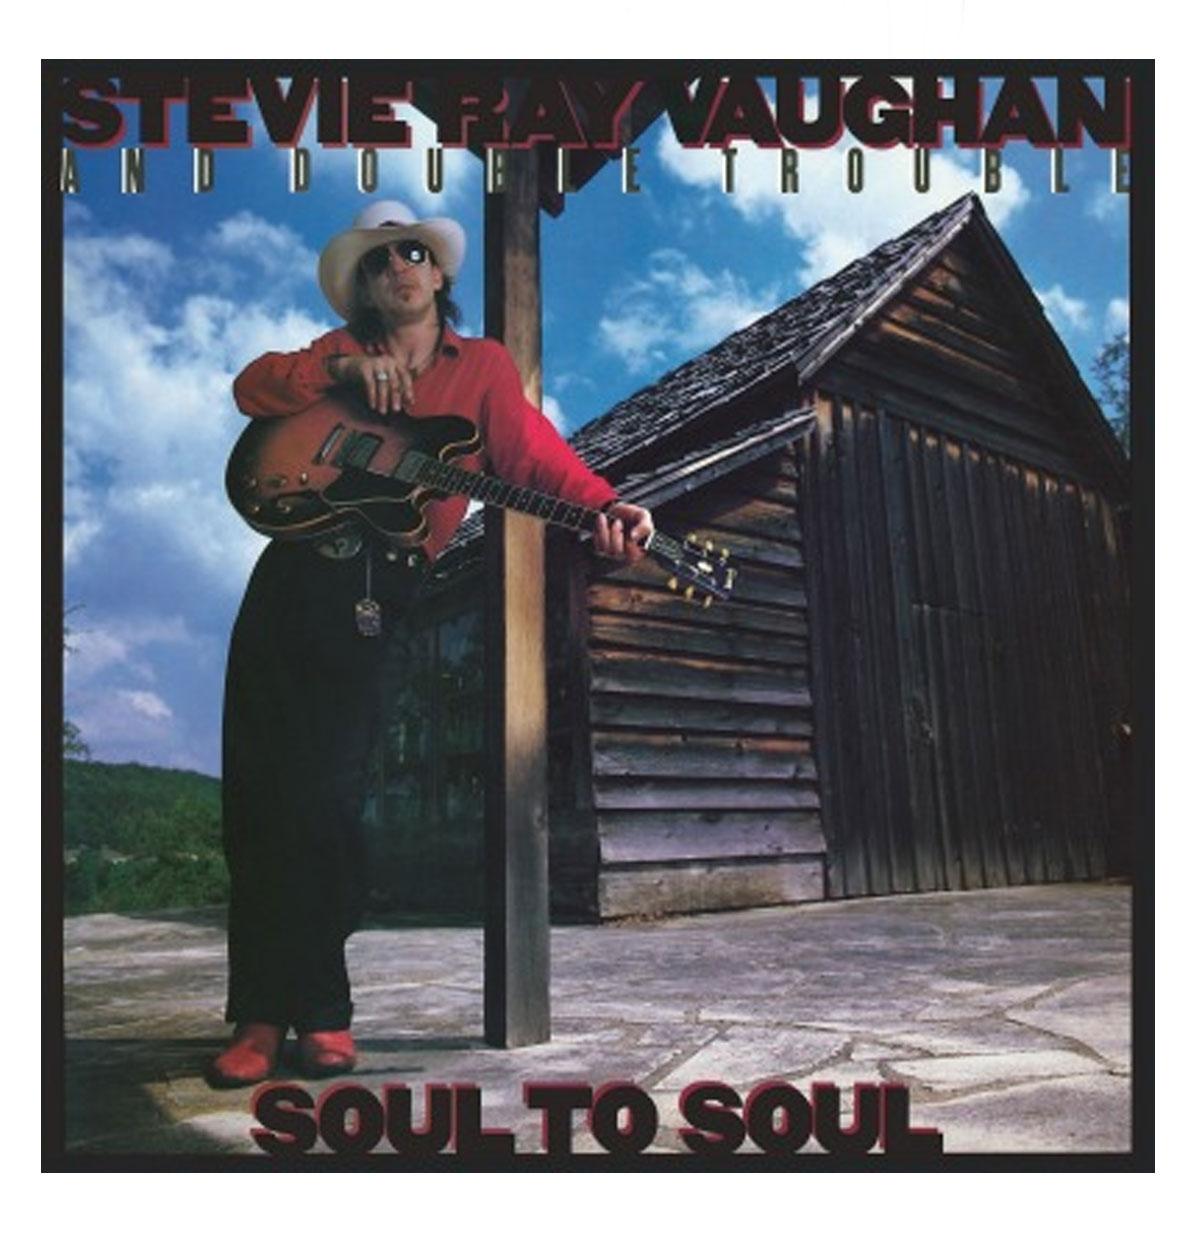 Stevie Ray Vaughan - Soul To Soul LP